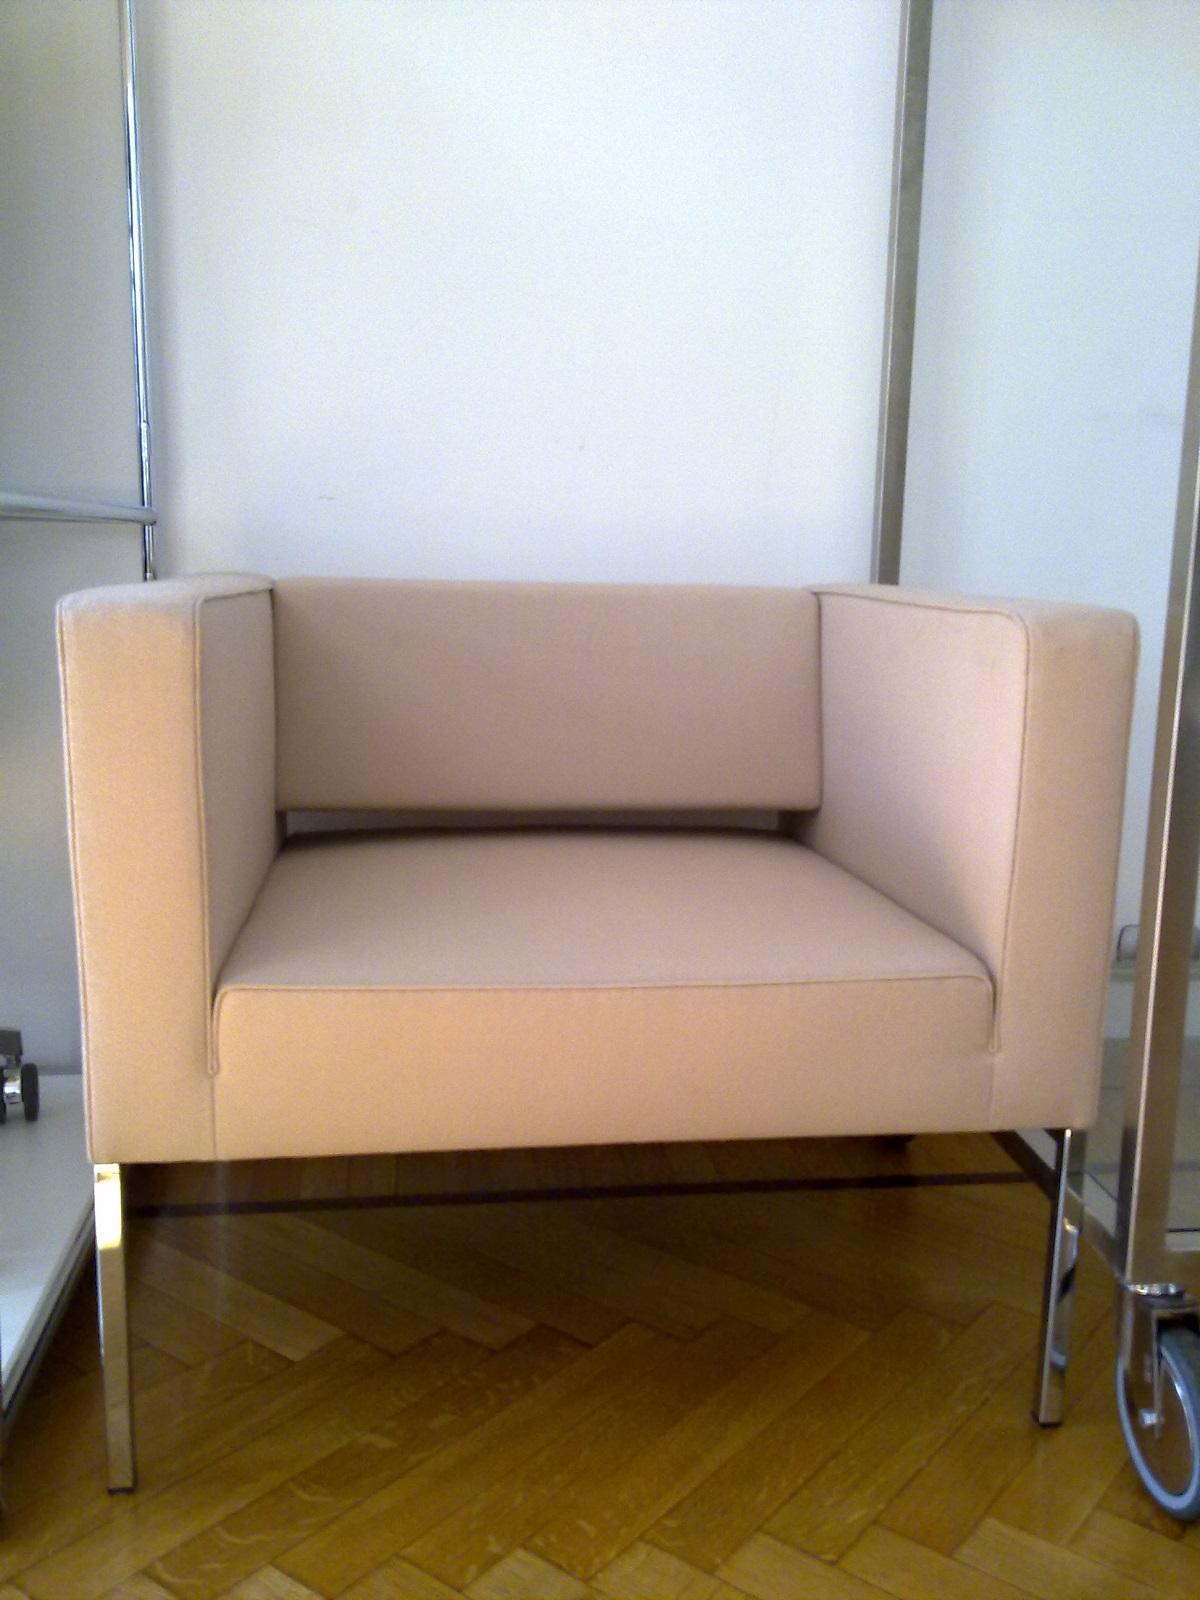 outlet offerte arredi mobili sedute ufficio torino | ADV.EU